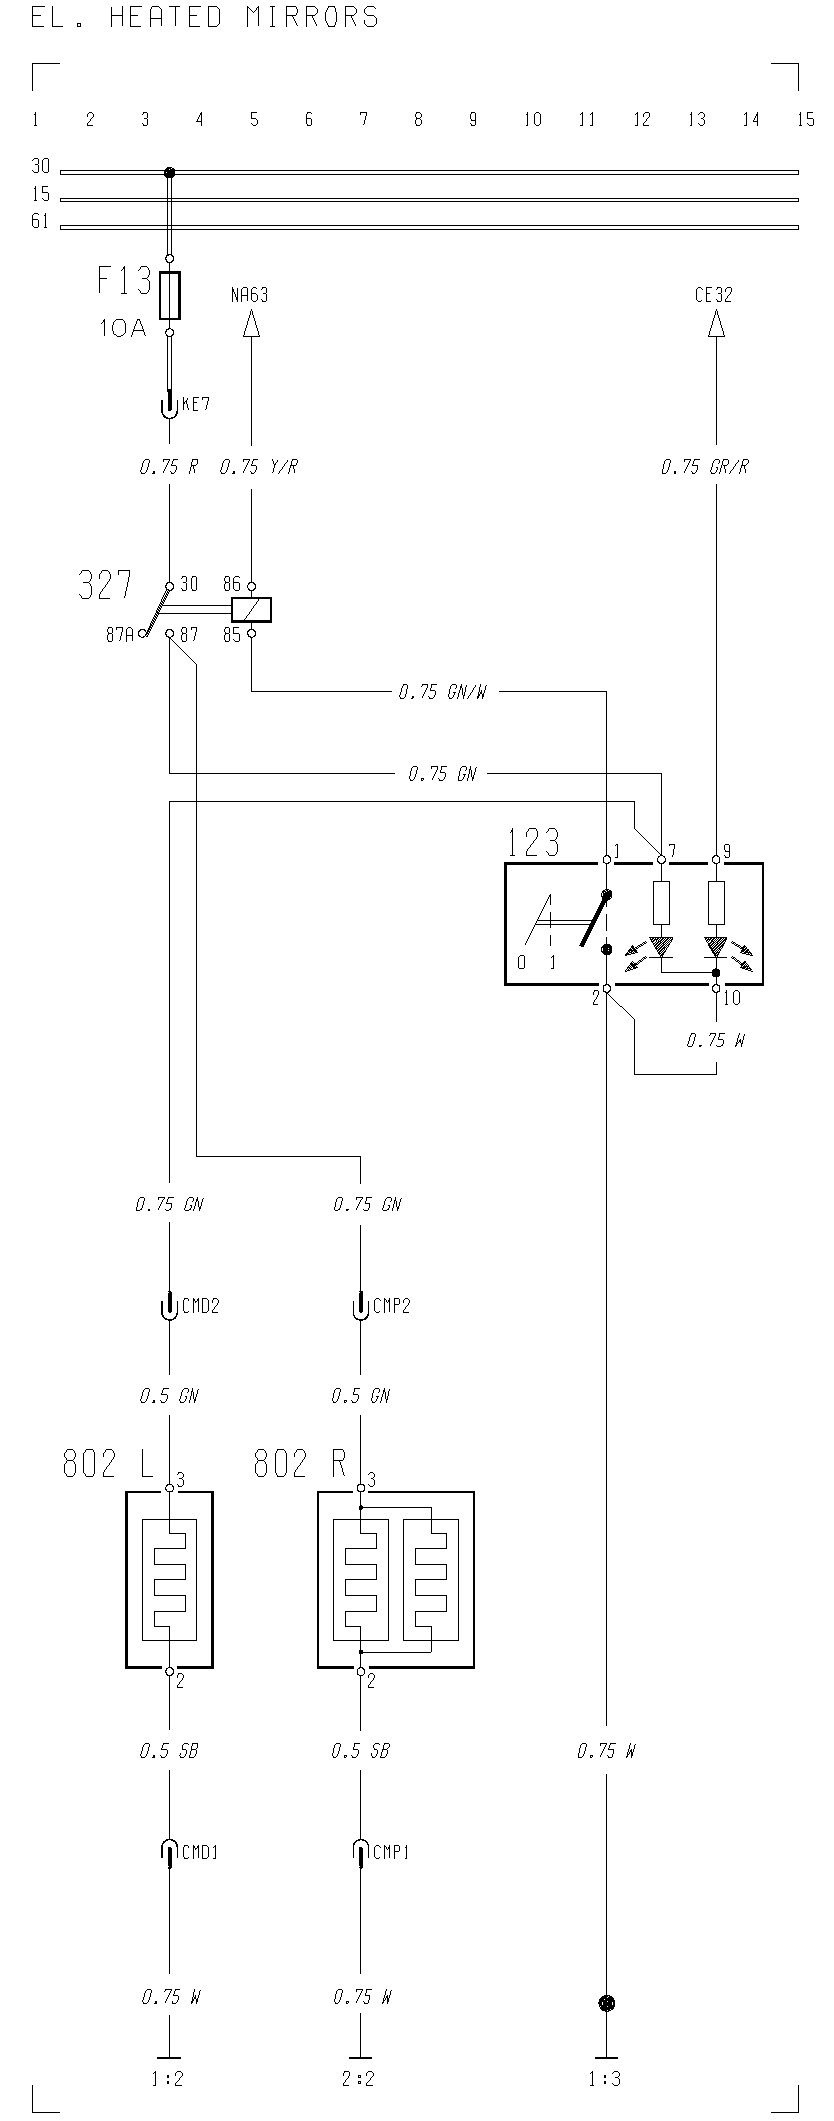 Heated Mirror Wiring Diagram Trusted Diagrams Astro Van Volvo F12 F16 El Mirrors Carknowledge And Controls